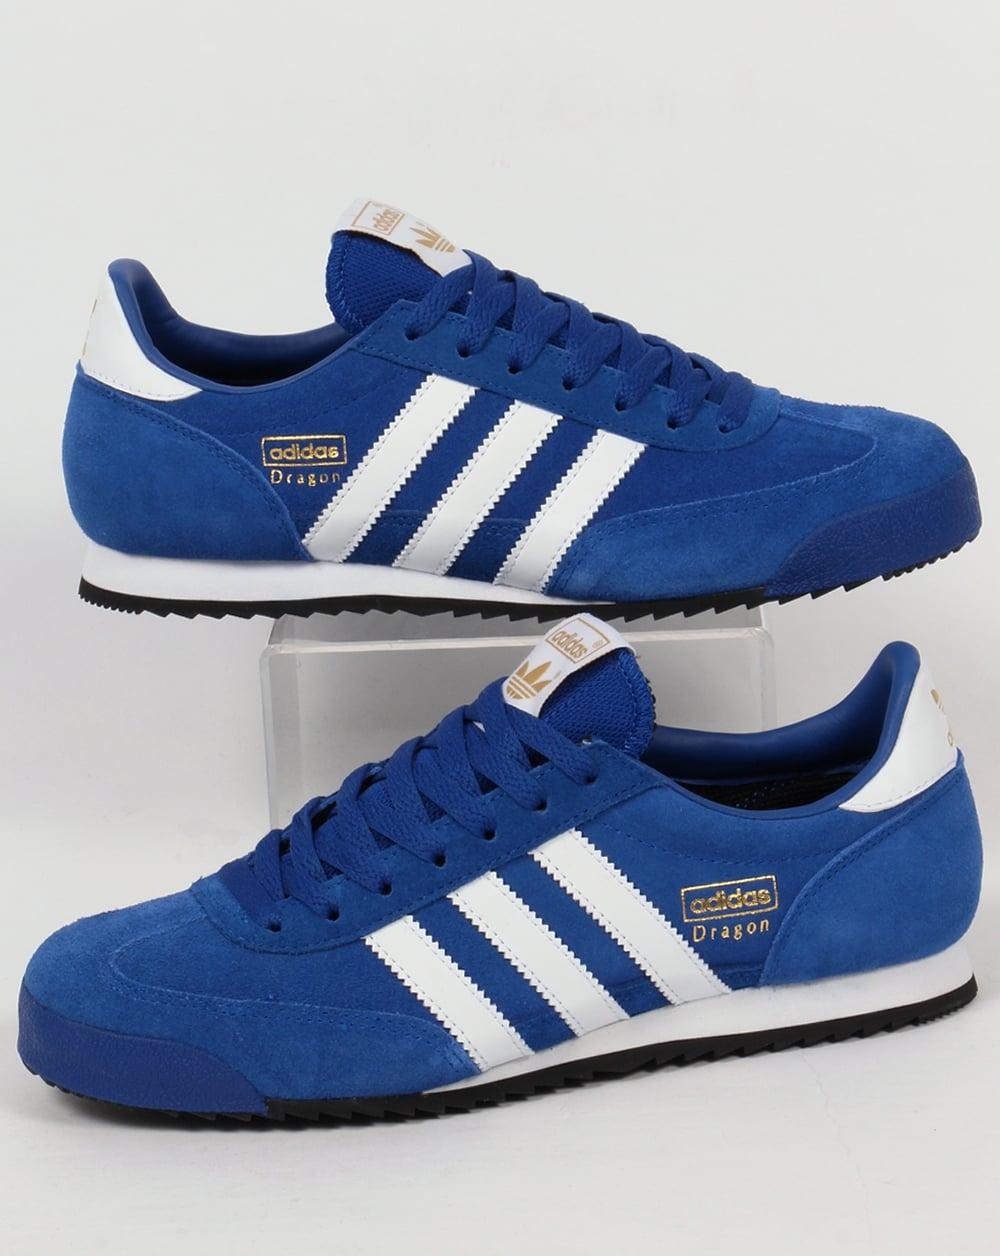 8ea47d00322e4e adidas Trainers Adidas Dragon Trainers Royal White Black